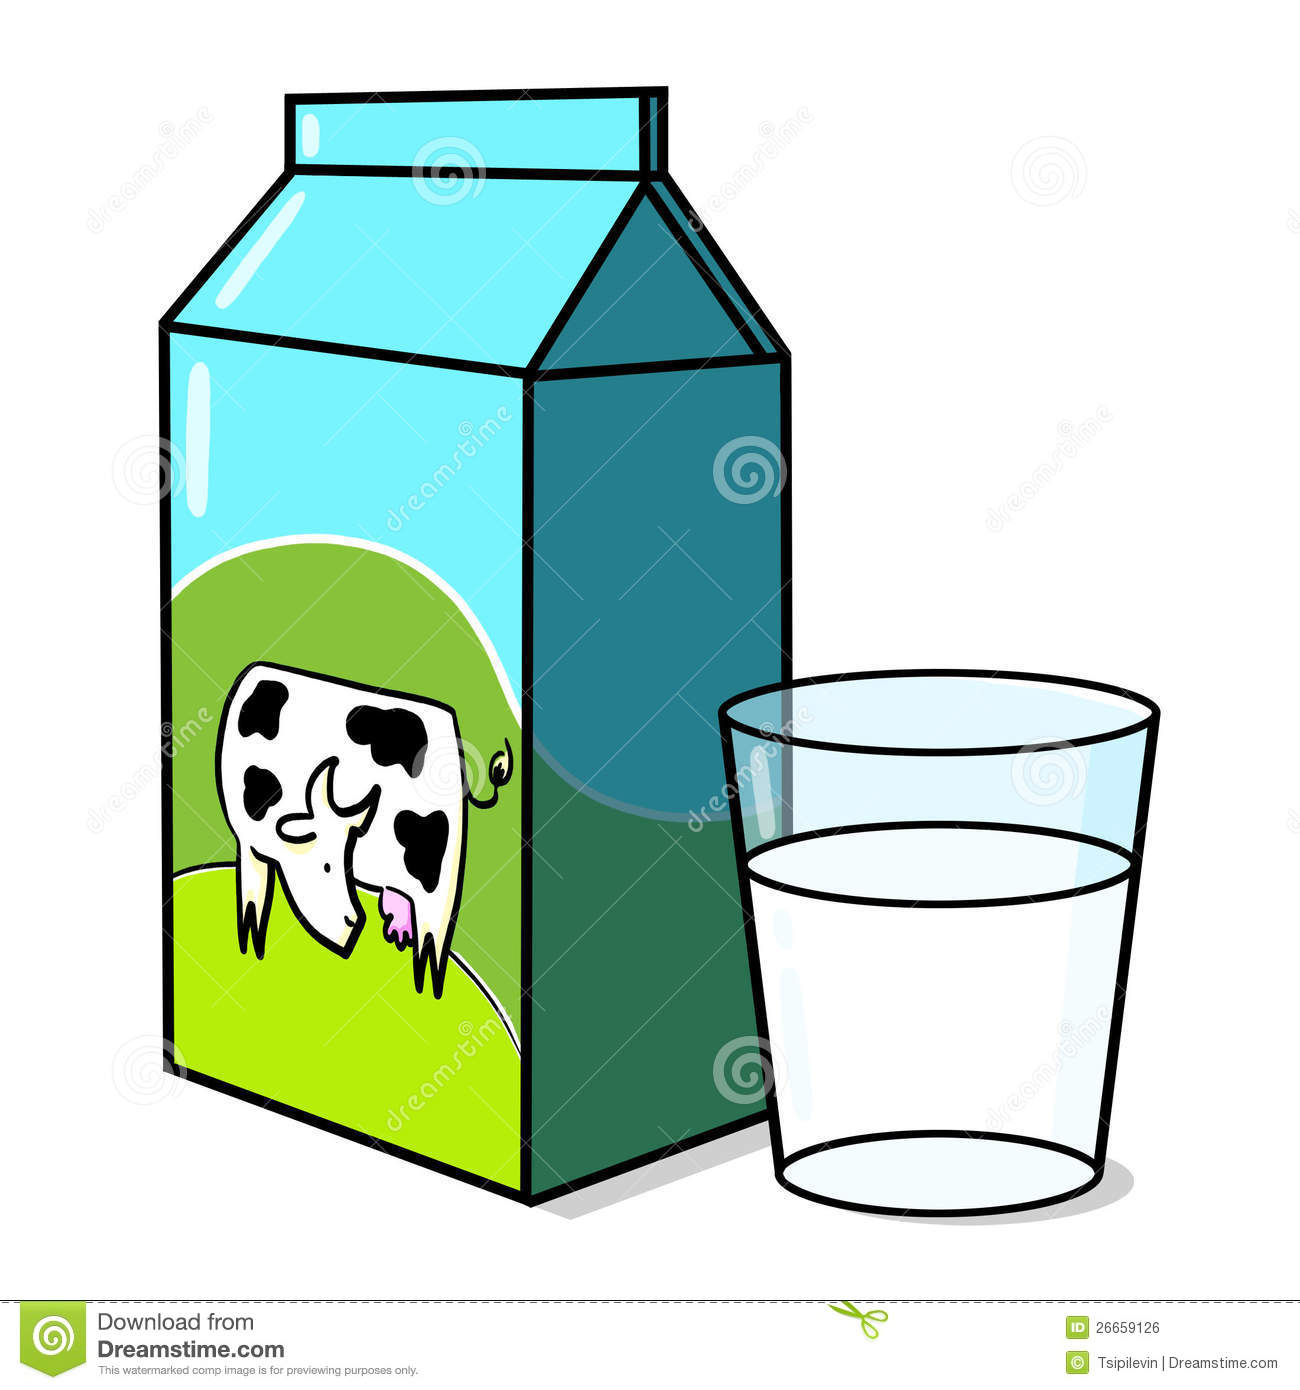 Milk Clipart u0026amp; Milk Clip Art Images - ClipartALL clipartall clipartall.com